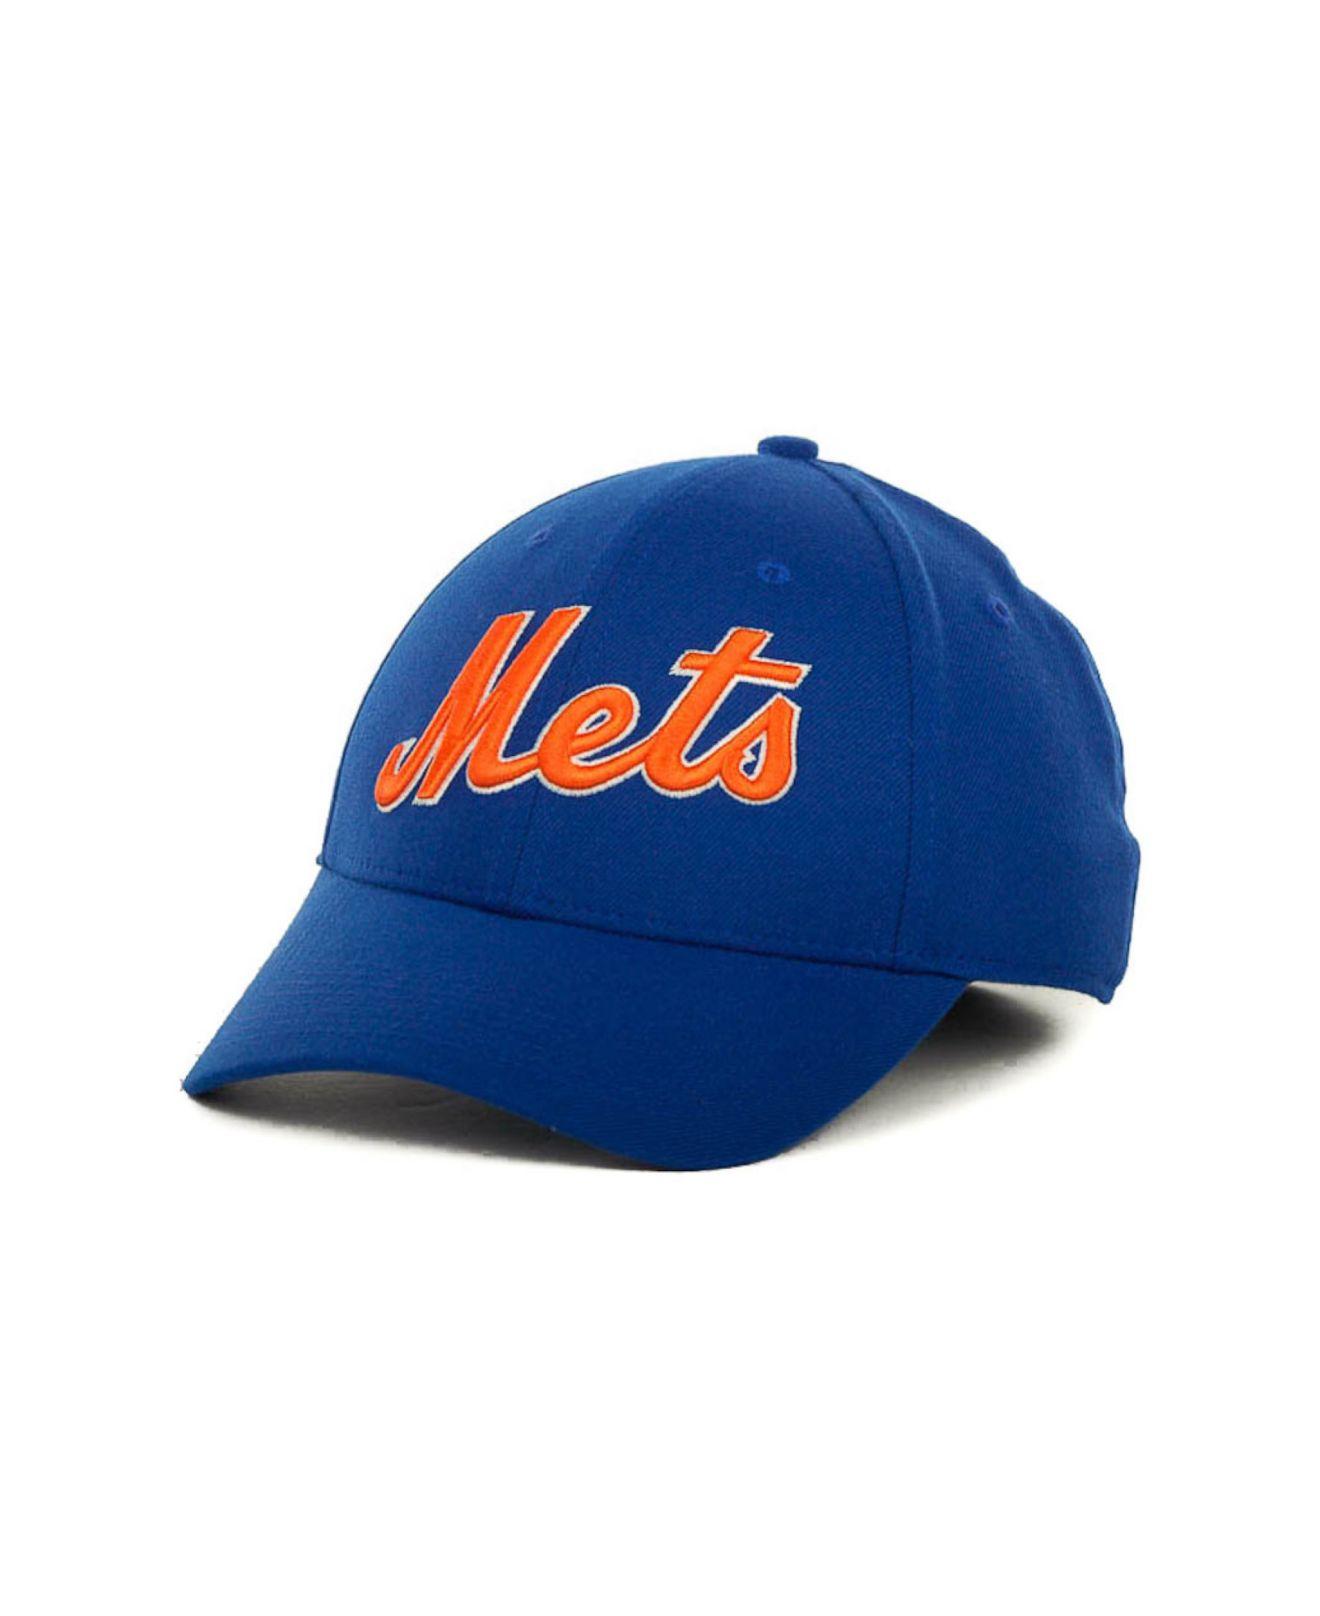 Lyst - Nike New York Mets Dri-fit Swoosh Flex Cap in Blue for Men e5c05c0b6669